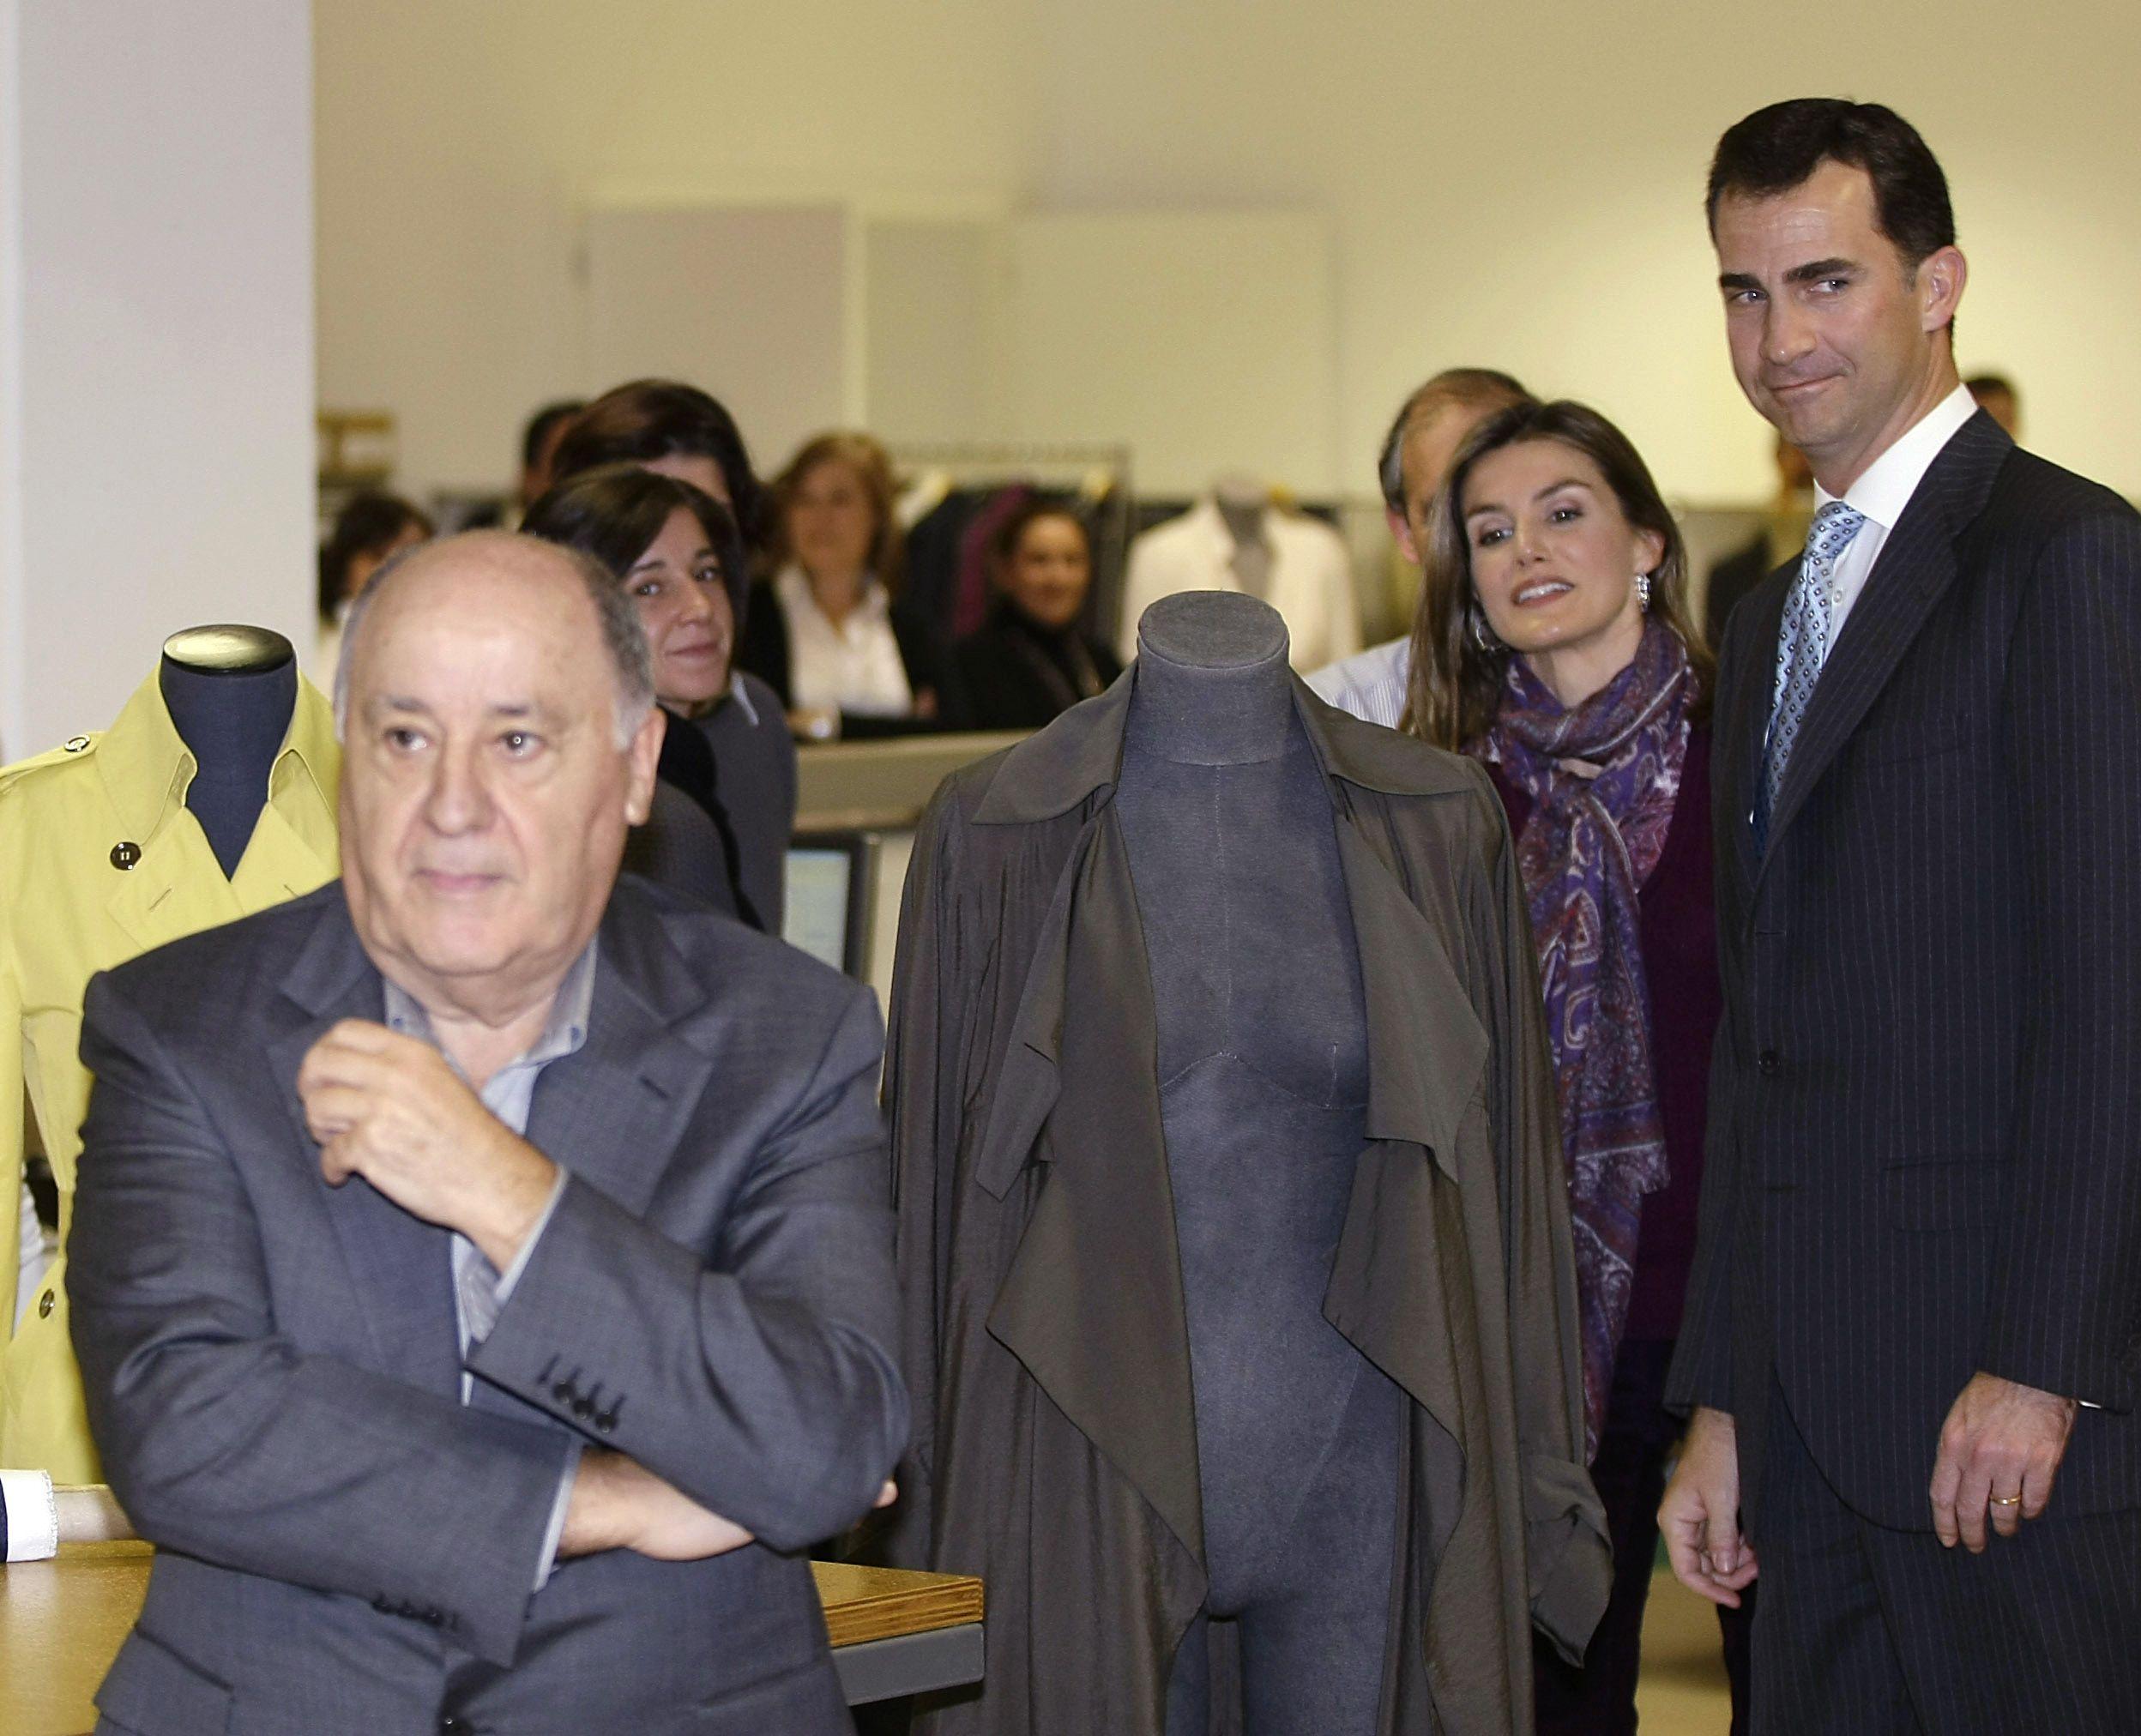 Amancio Ortega and Spain's royal family